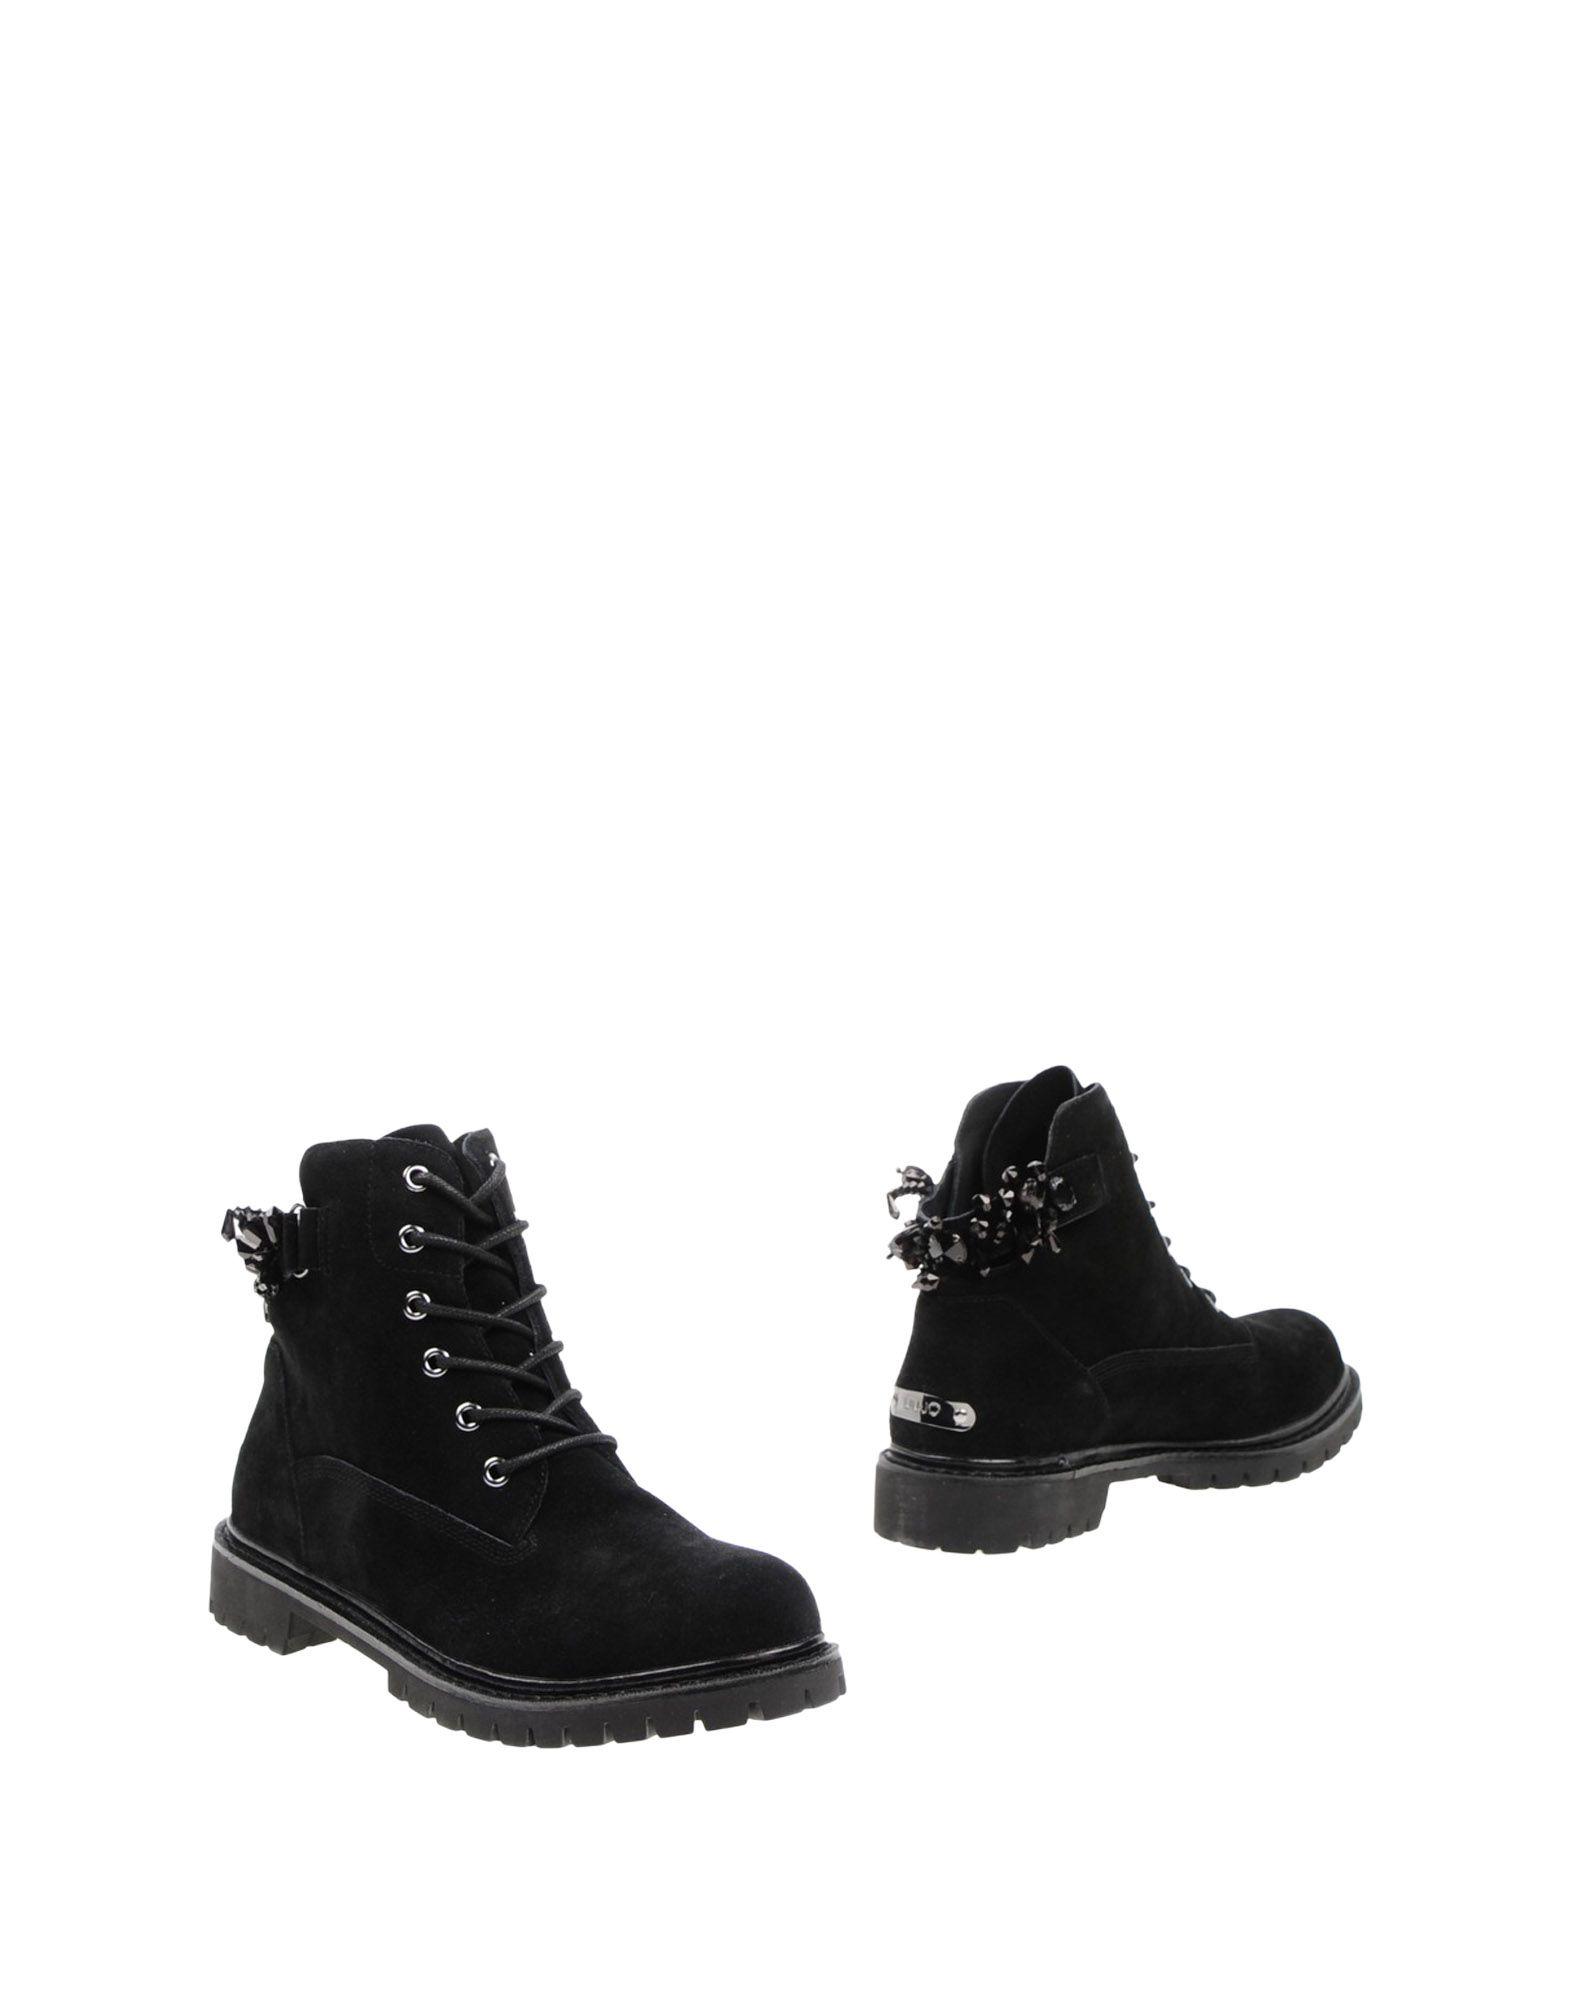 Liu •Jo Shoes Stiefelette Damen  11406770UH Gute Qualität beliebte Schuhe